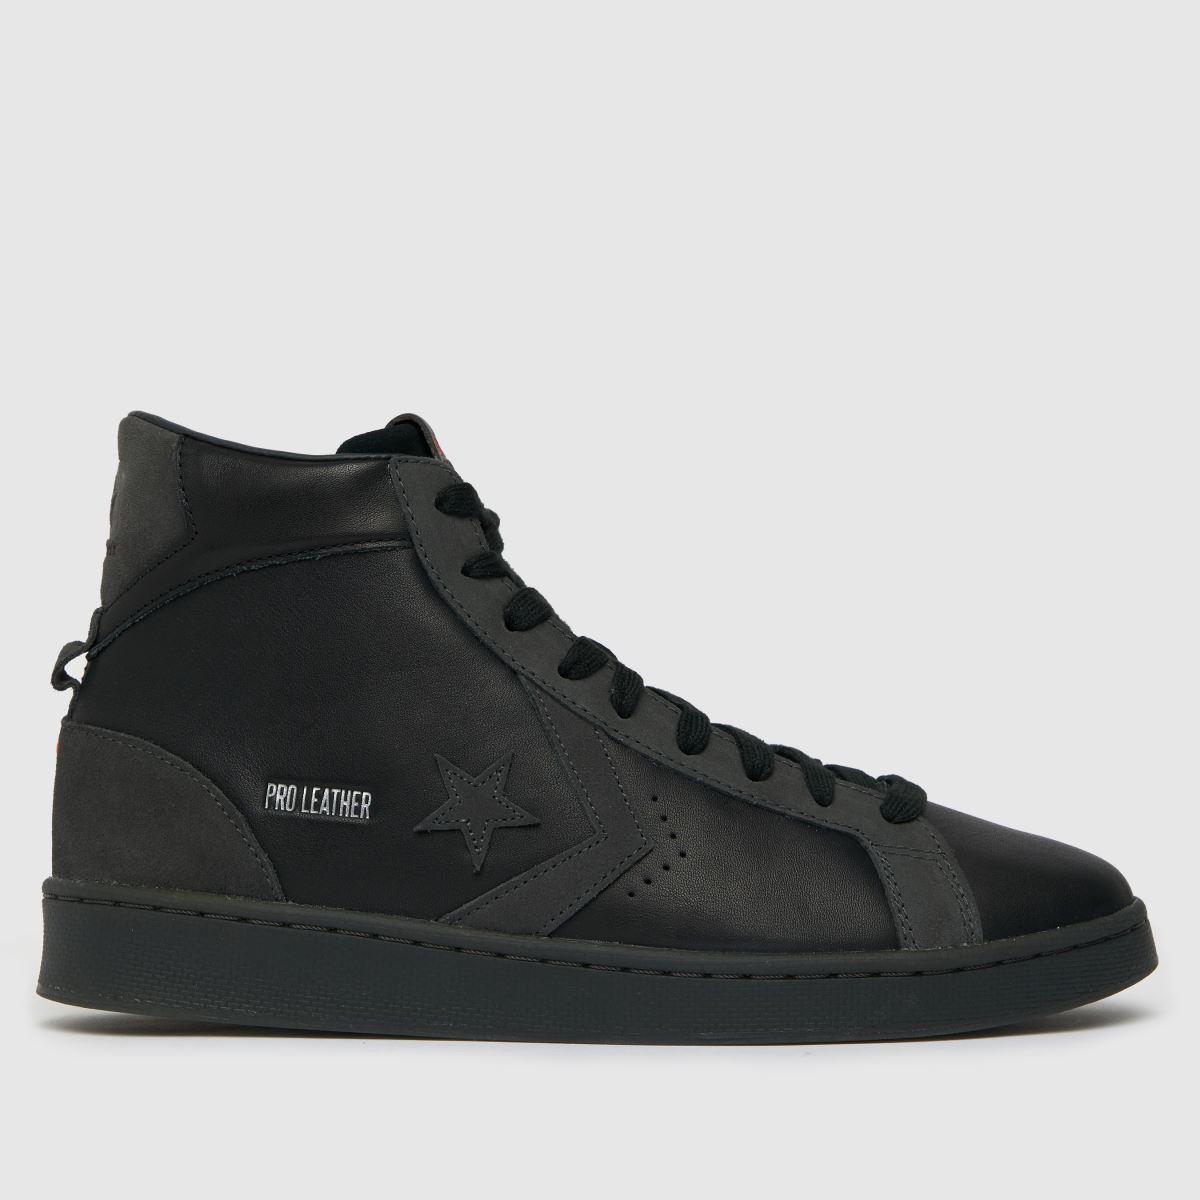 Converse Black Ctas Hi Pro Leather Mid Trainers